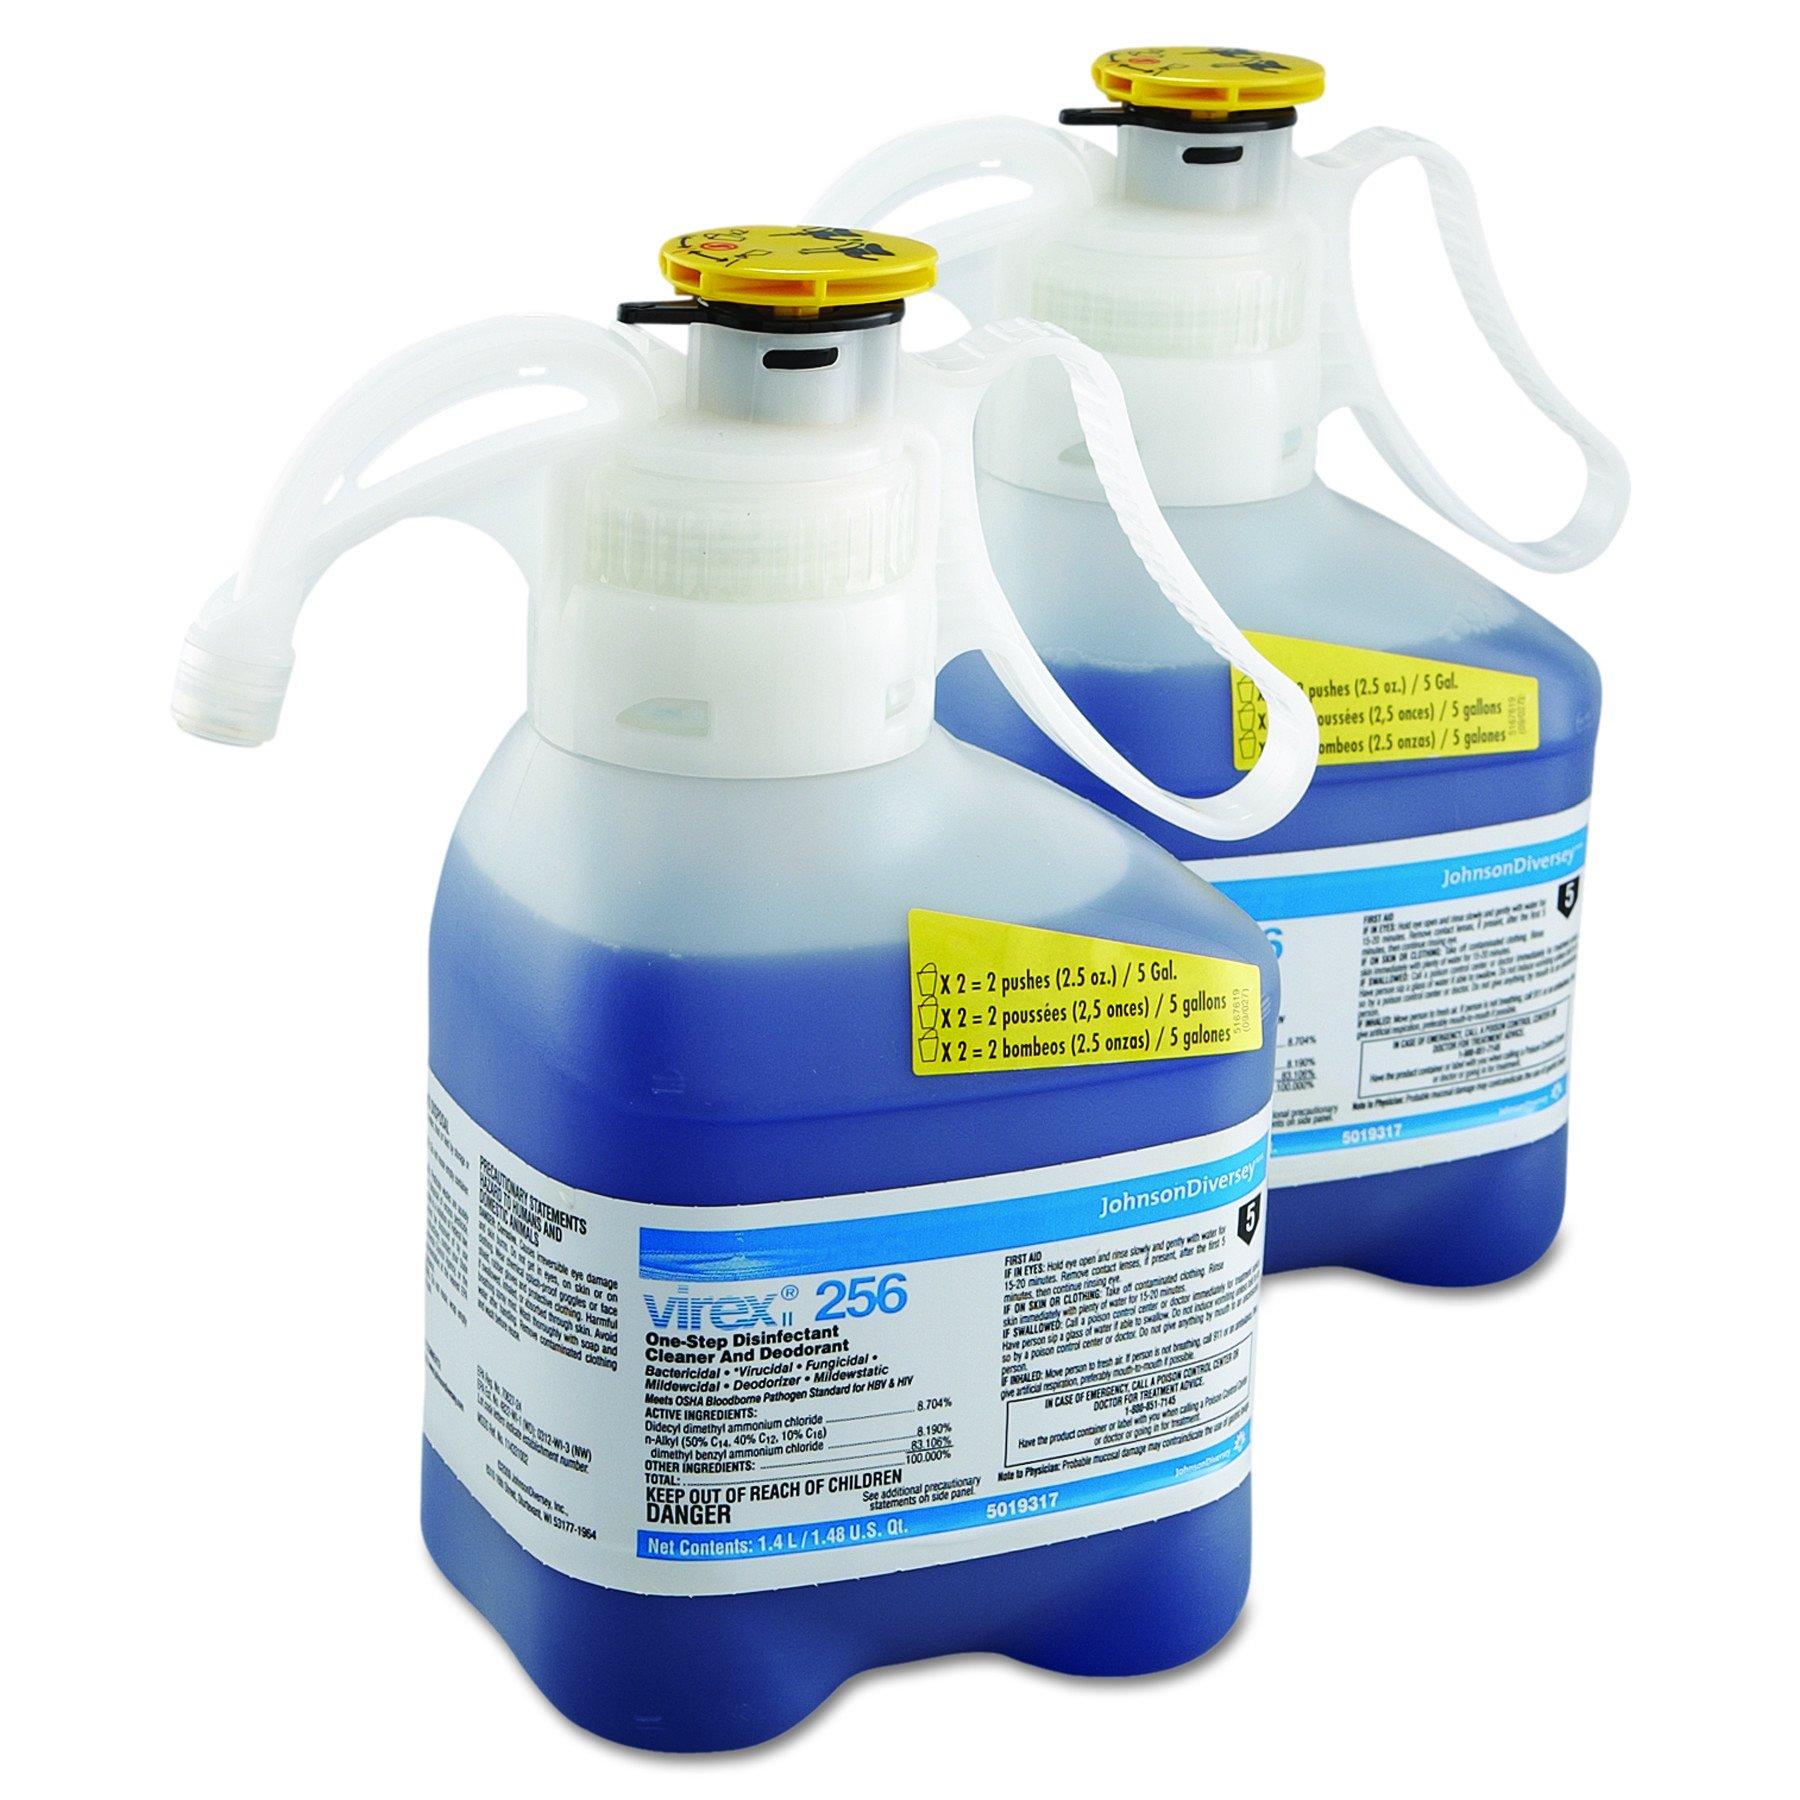 Diversey 5019317 256 Virex One-Step Disinfectant Cleaner Deodorant, Mint Scent, Liquid, 47.3 oz. (2 bottles)